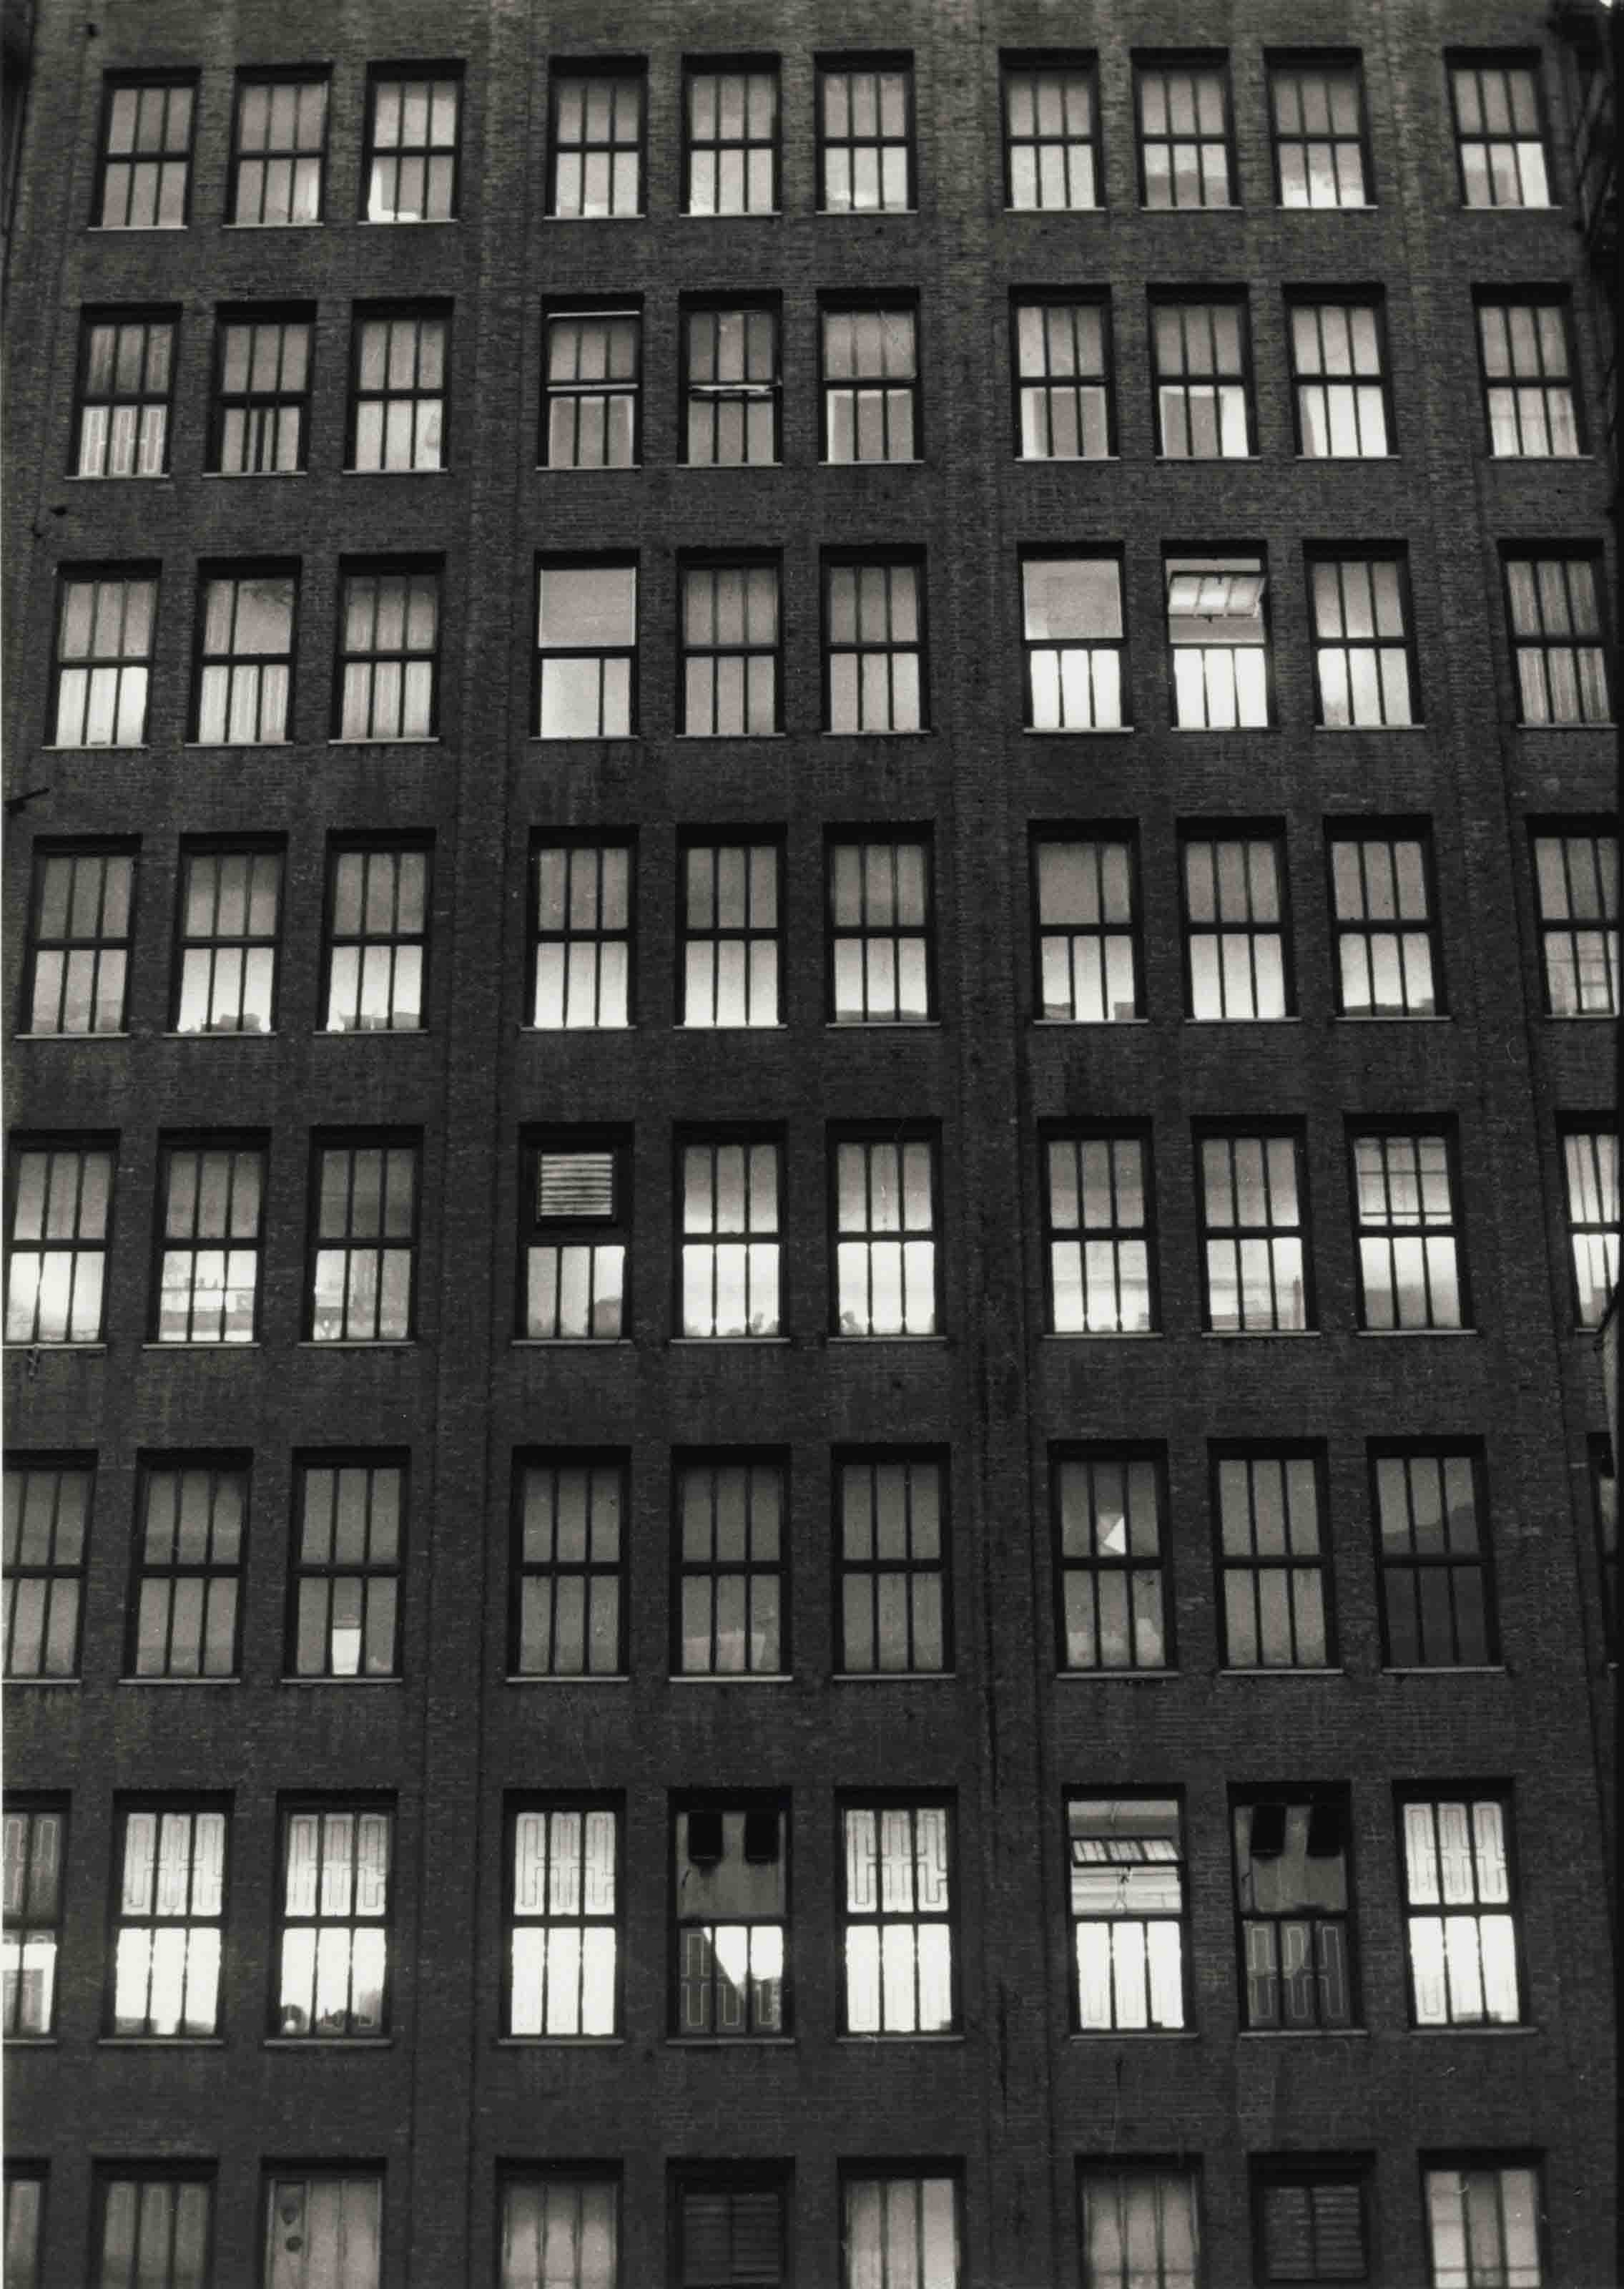 Factory Building 2, c. 1975